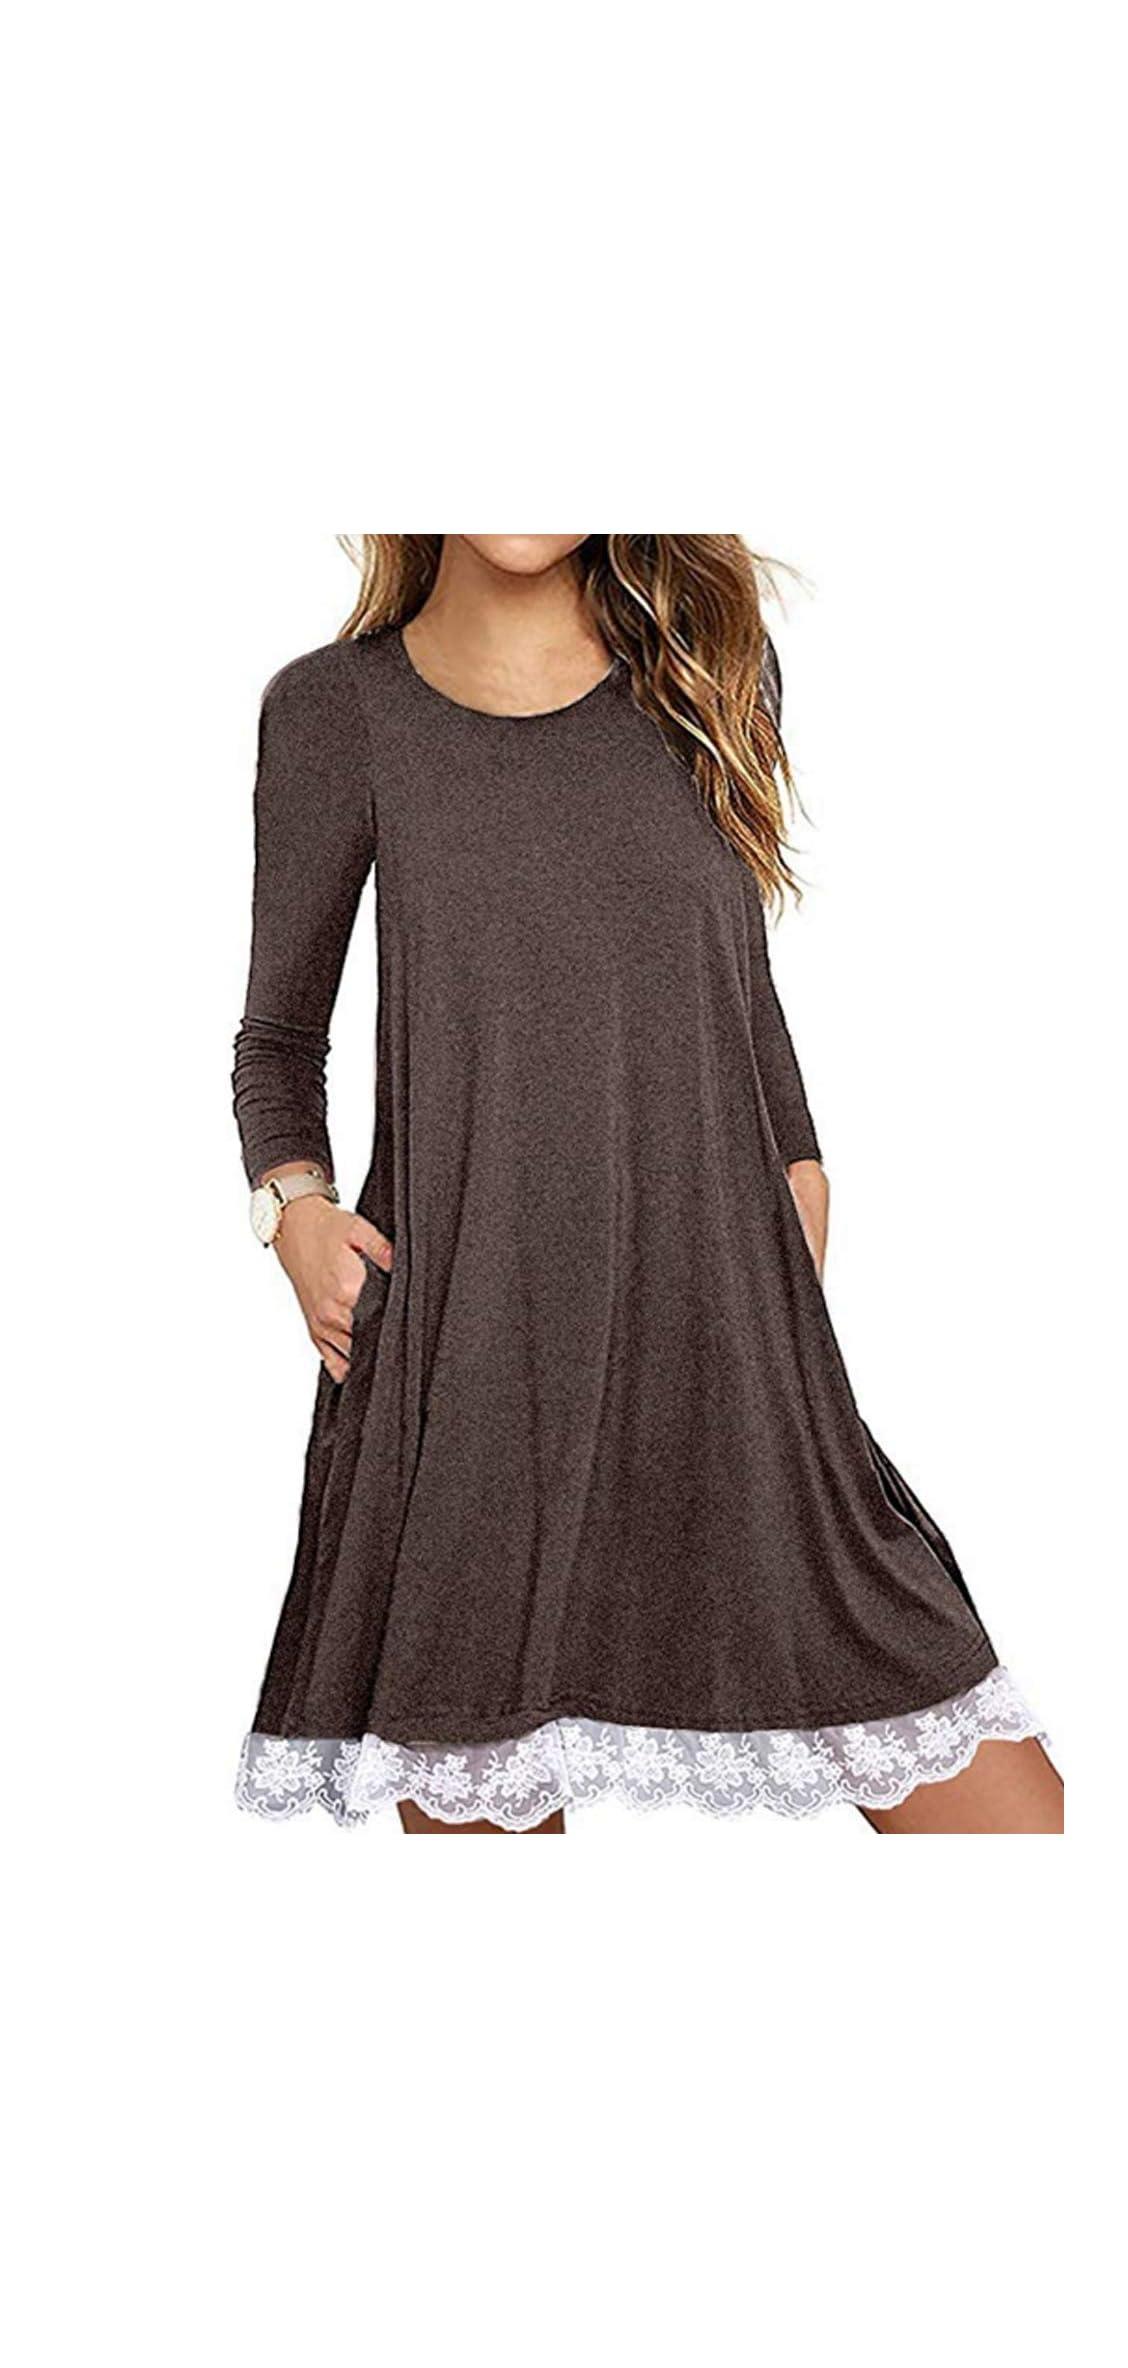 Women's Summer Fall Short Sleeve/long Sleeve Lace Hem